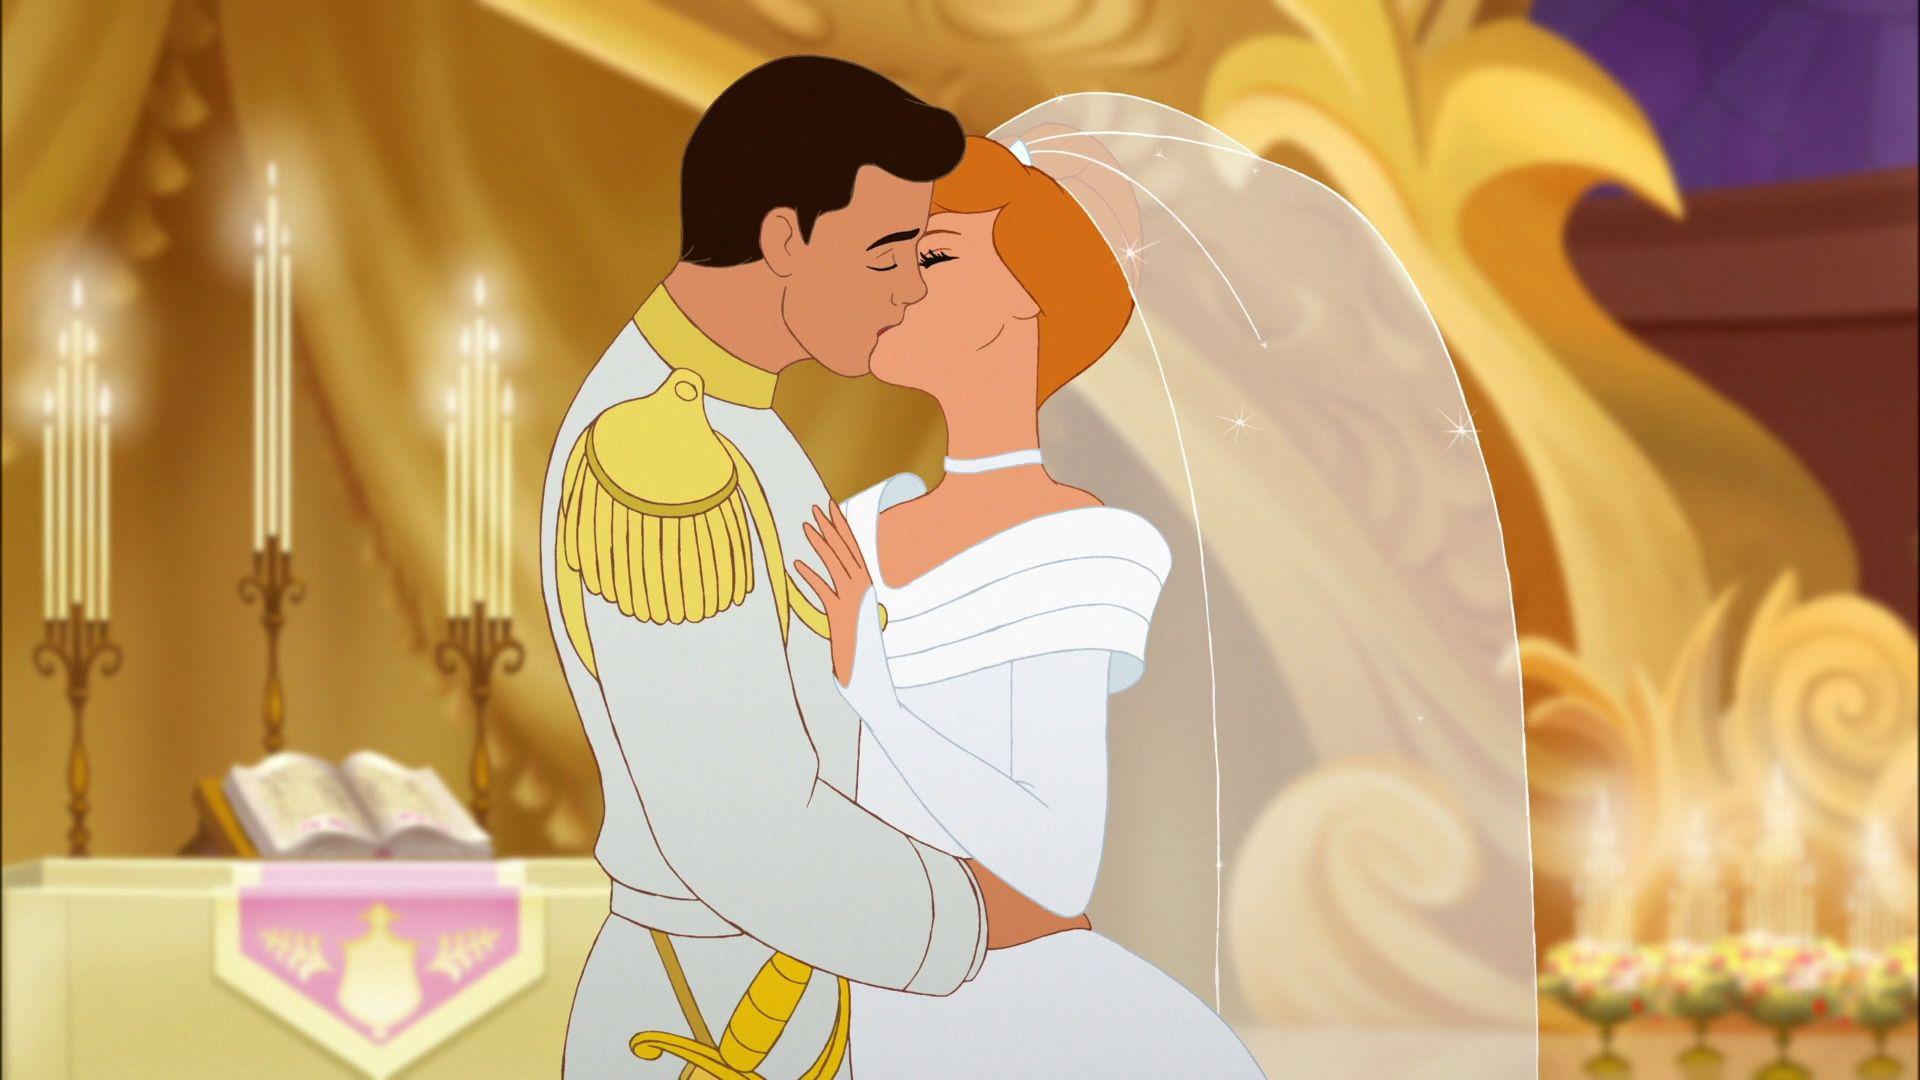 cinderella and prince charmings kiss on their wedding day